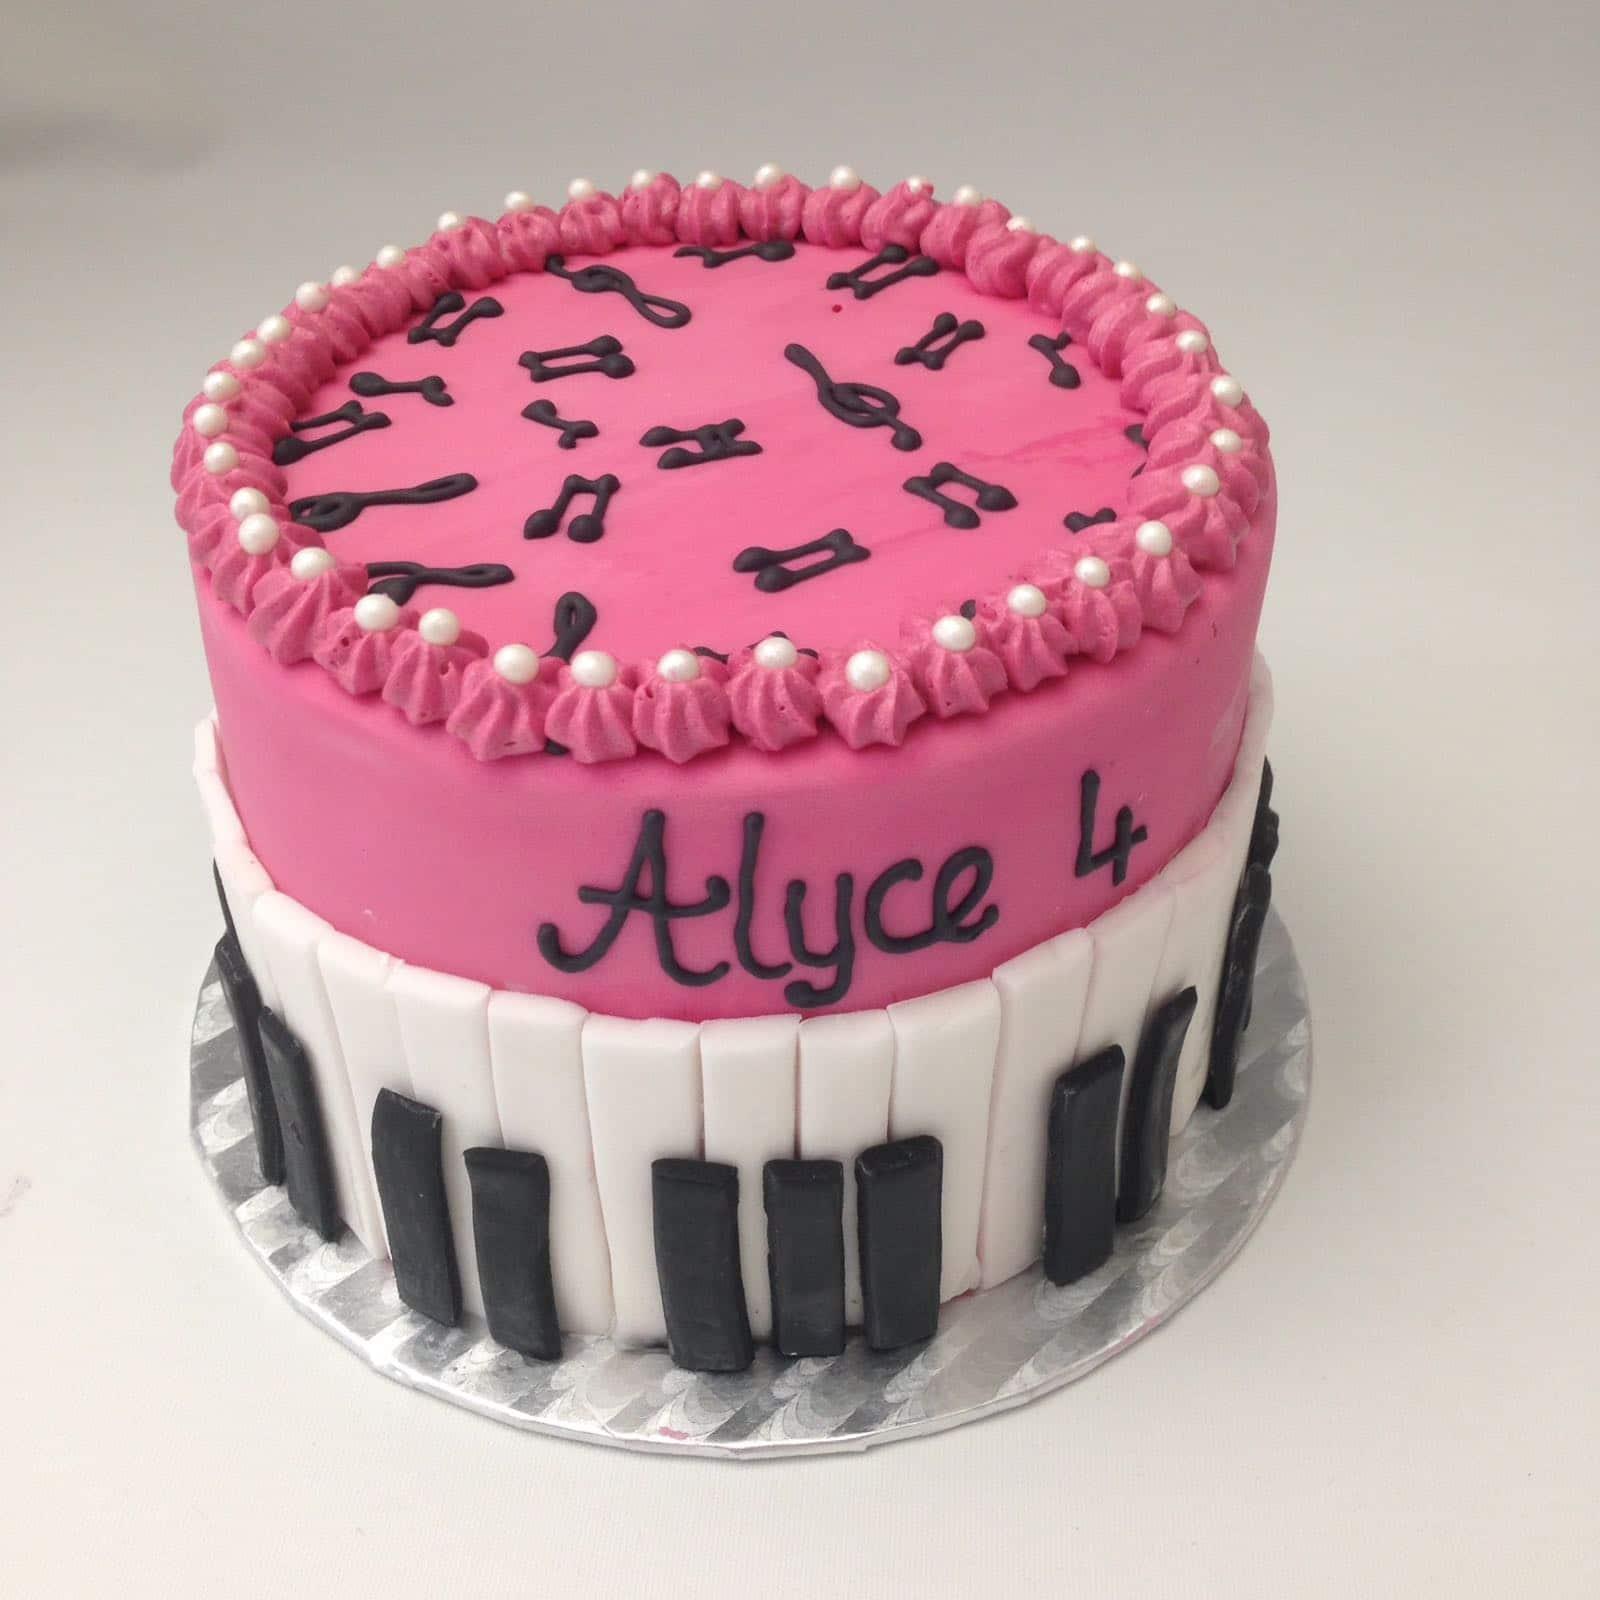 Muziektaart, music cake, muziek thema taart, music themed cake, muziektaart kopen, buy music cake, order music cake, instrumenten taart, instrument cake, muziektaart amsterdam, music cake amsterdam, muziektaart bestellen, order music cake, Cupcakes, Cakes, cakes amsterdam, cake shop amsterdam, cupcake winkel amsterdam, taart amsterdam kopen, red velvet amsterdam, red velvet kopen, birthday cake amsterdam, verjaardagstaart amsterdam, red velvet cake, red velvet taart, american red velvet amsterdam, red velvet cake amsterdam, red velvet cake bestellen, wedding cake, bruidstaart, thema taart, theme cake, customized cake, corporate cake, big cake amsterdam, grote taart bestelling, stapeltaart bestellen, gender reveal cake amsterdam, gender reveal taart amsterdam, birthdayparty cake, kinderfeestje traktatie, , online taarten winkel, online taarten kopen, online taarten bestellen, webshop cakes, order cakes online, bakery amsterdam, amsterdam bakkerij, american bakery amsterdam, cheesecake kopen, cheesecake bestellen, red velvet cheesecake, birthdayparty cake, cupcake amsterdam, cupcakes kopen, cupcakes bestellen, online cupcake winkel, online cupcakes kopen, online cupcakes bestellen, webshop cupcakes, order cupcakes online, bakery amsterdam, cakepops amsterdam, cakepop winkel amsterdam, cakepops bestellen, cupcakes traktatie, corporate cupcakes, corporate cake, corporate gift, zakelijke cupcakes, fair trade gebak, fair trade taart, fair trade cake, fair trade cupcakes